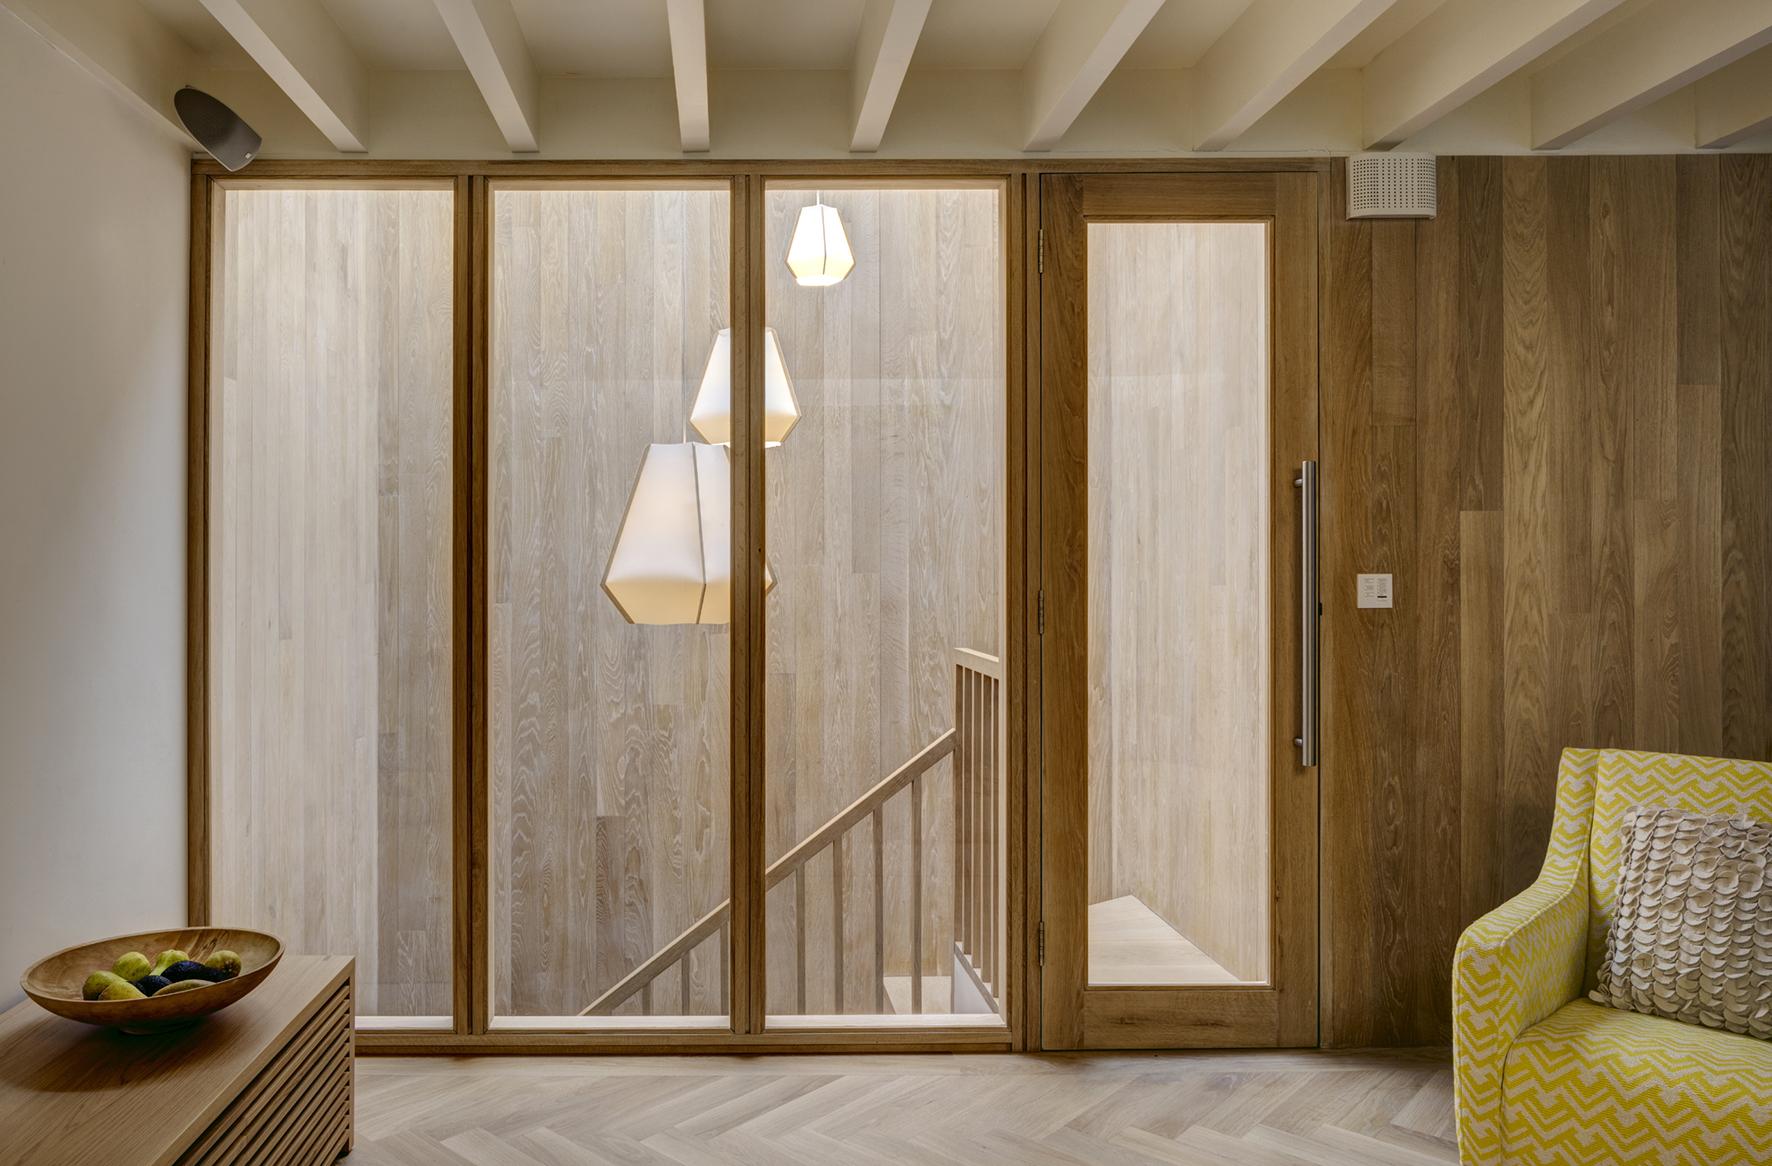 Den looking inot stair and lightwell credit Alan Parker.jpg